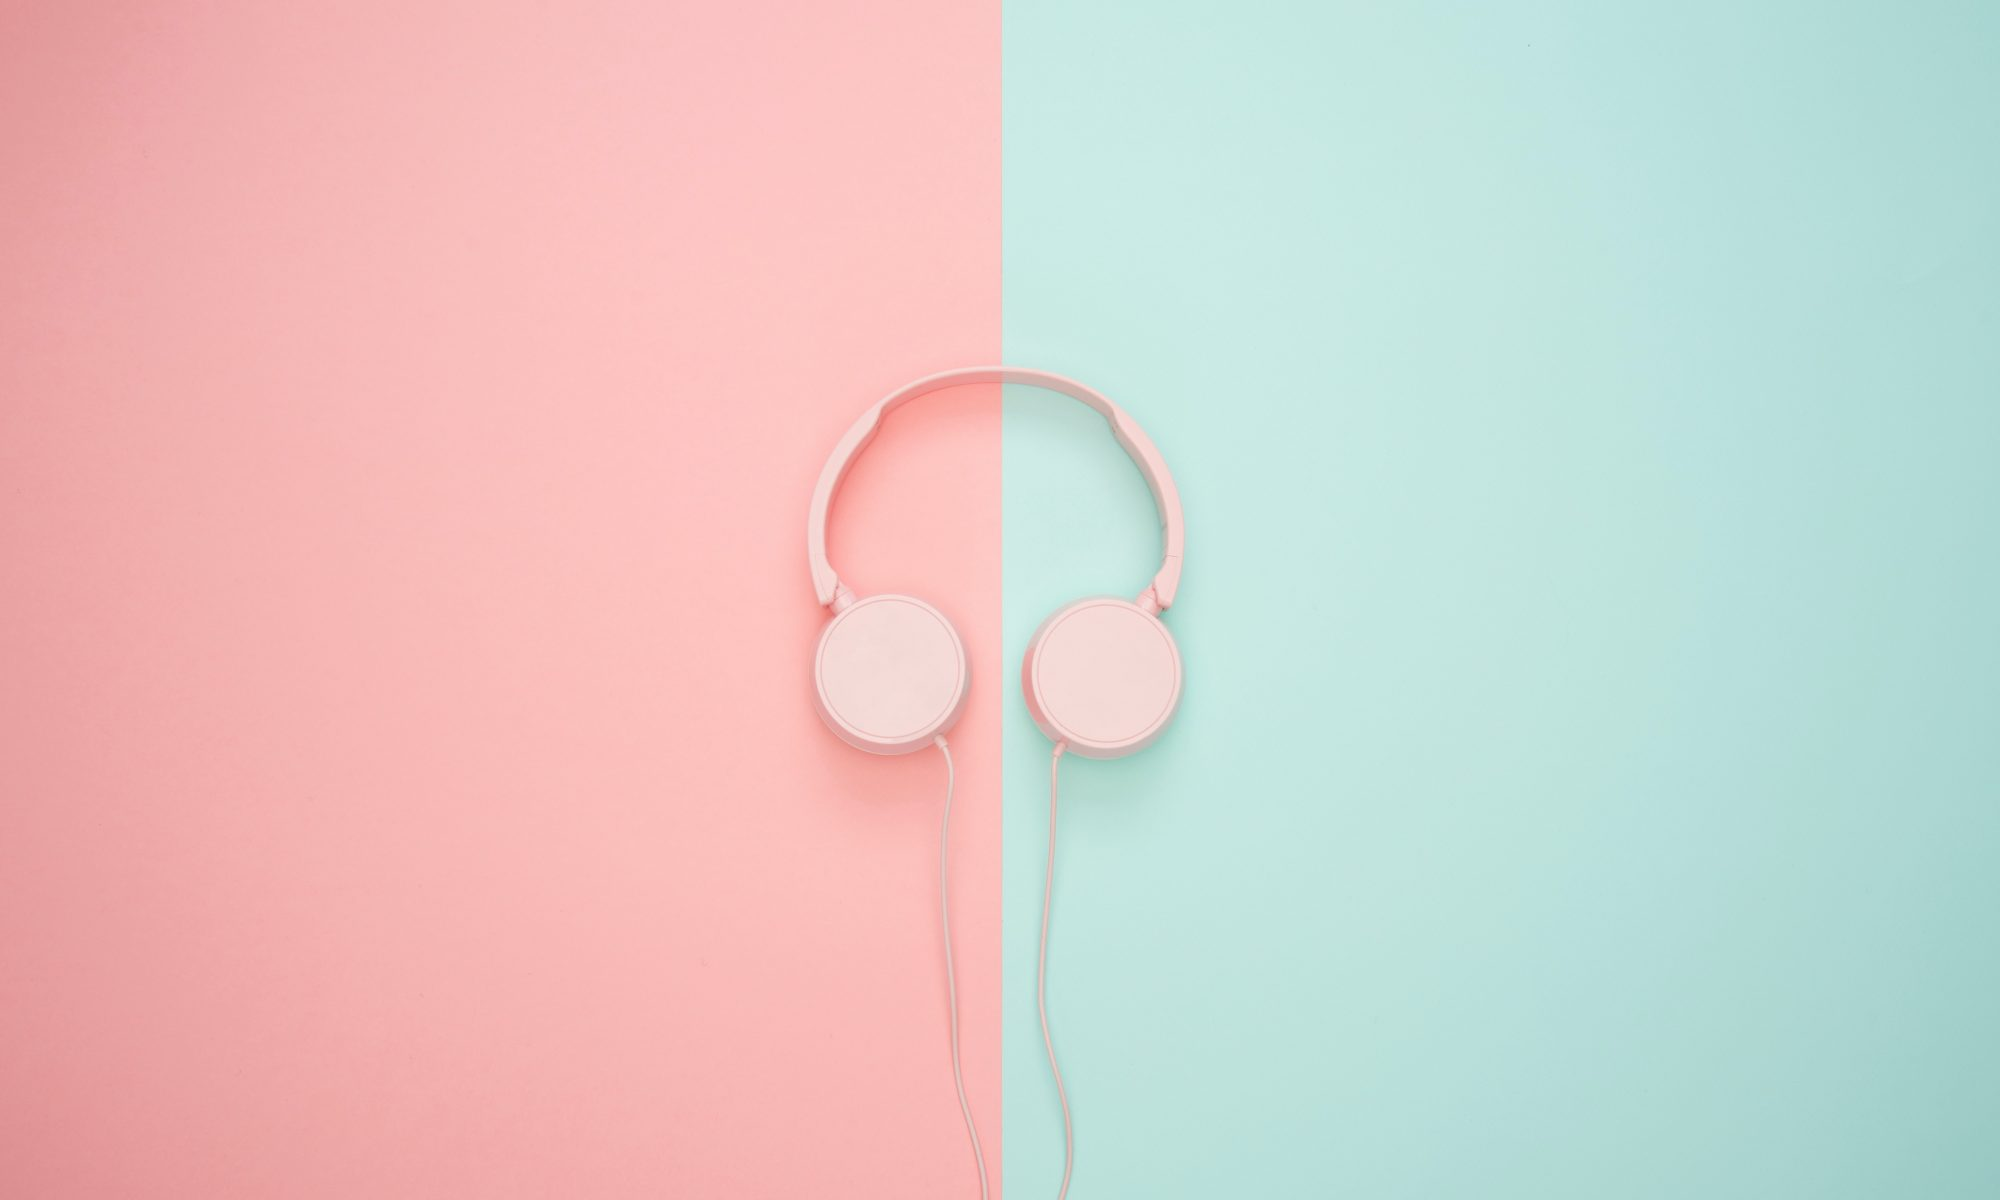 LGBT_Podcast_Headphones